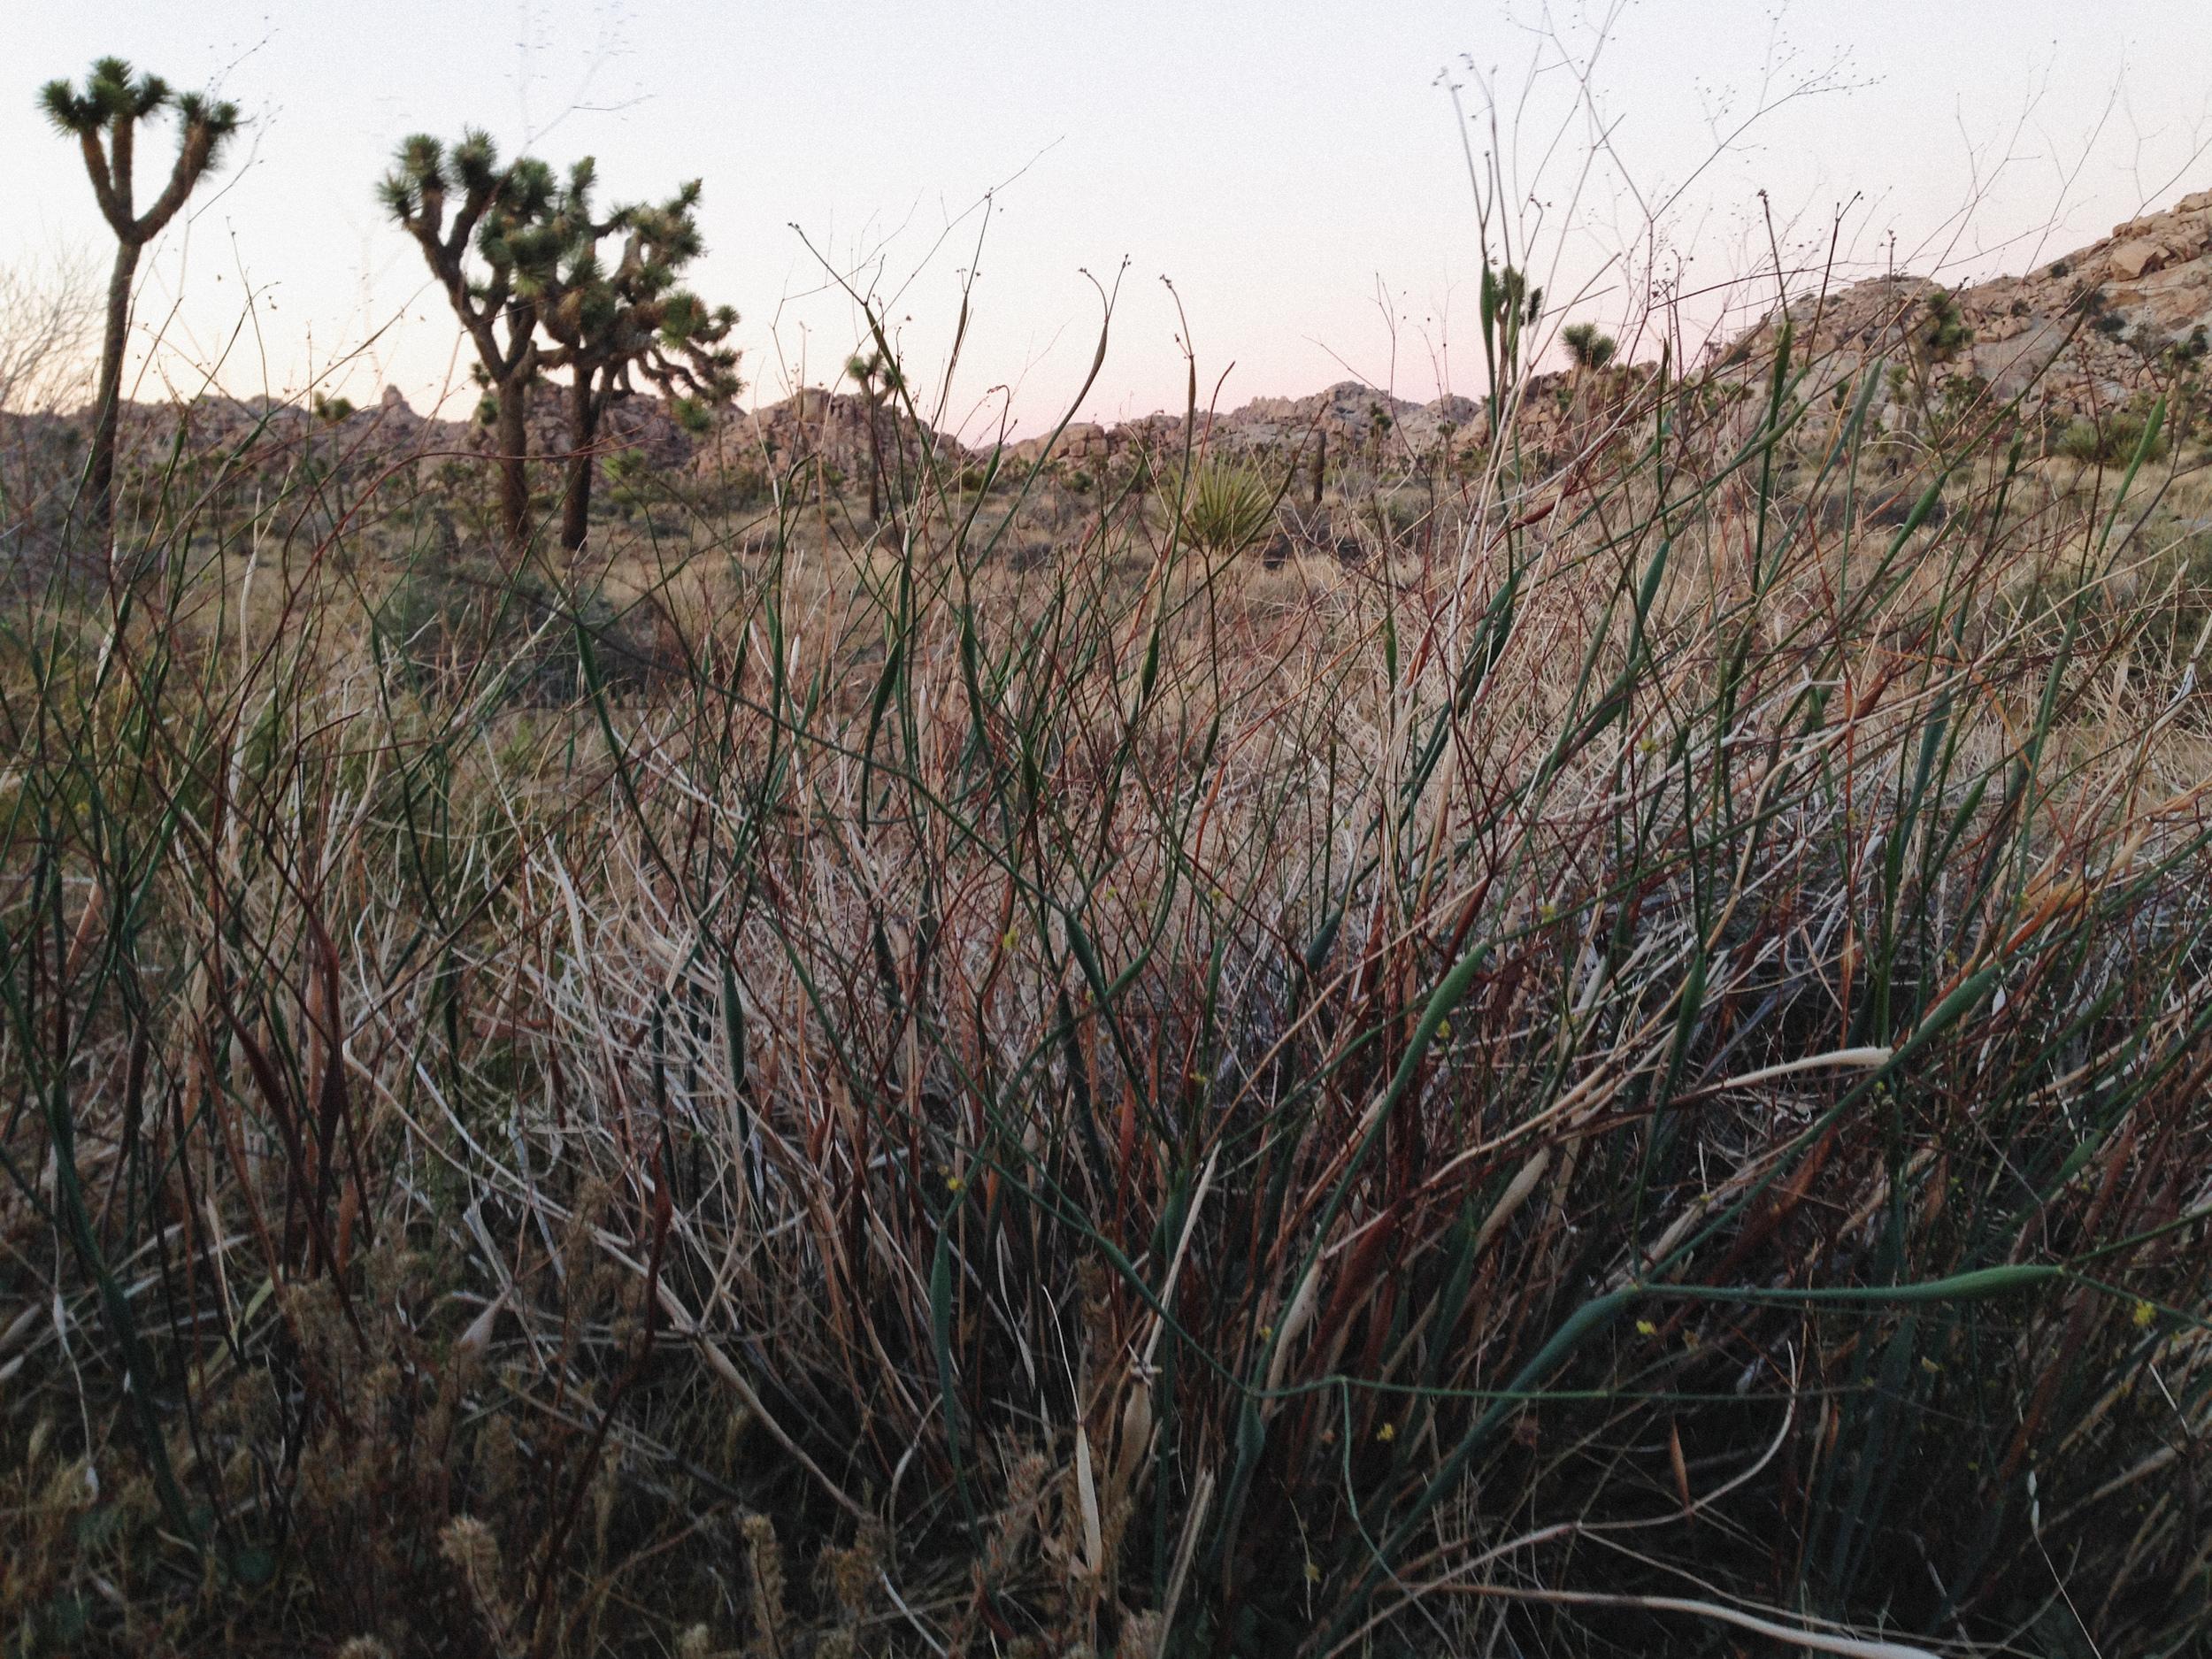 Joshua Tree grass